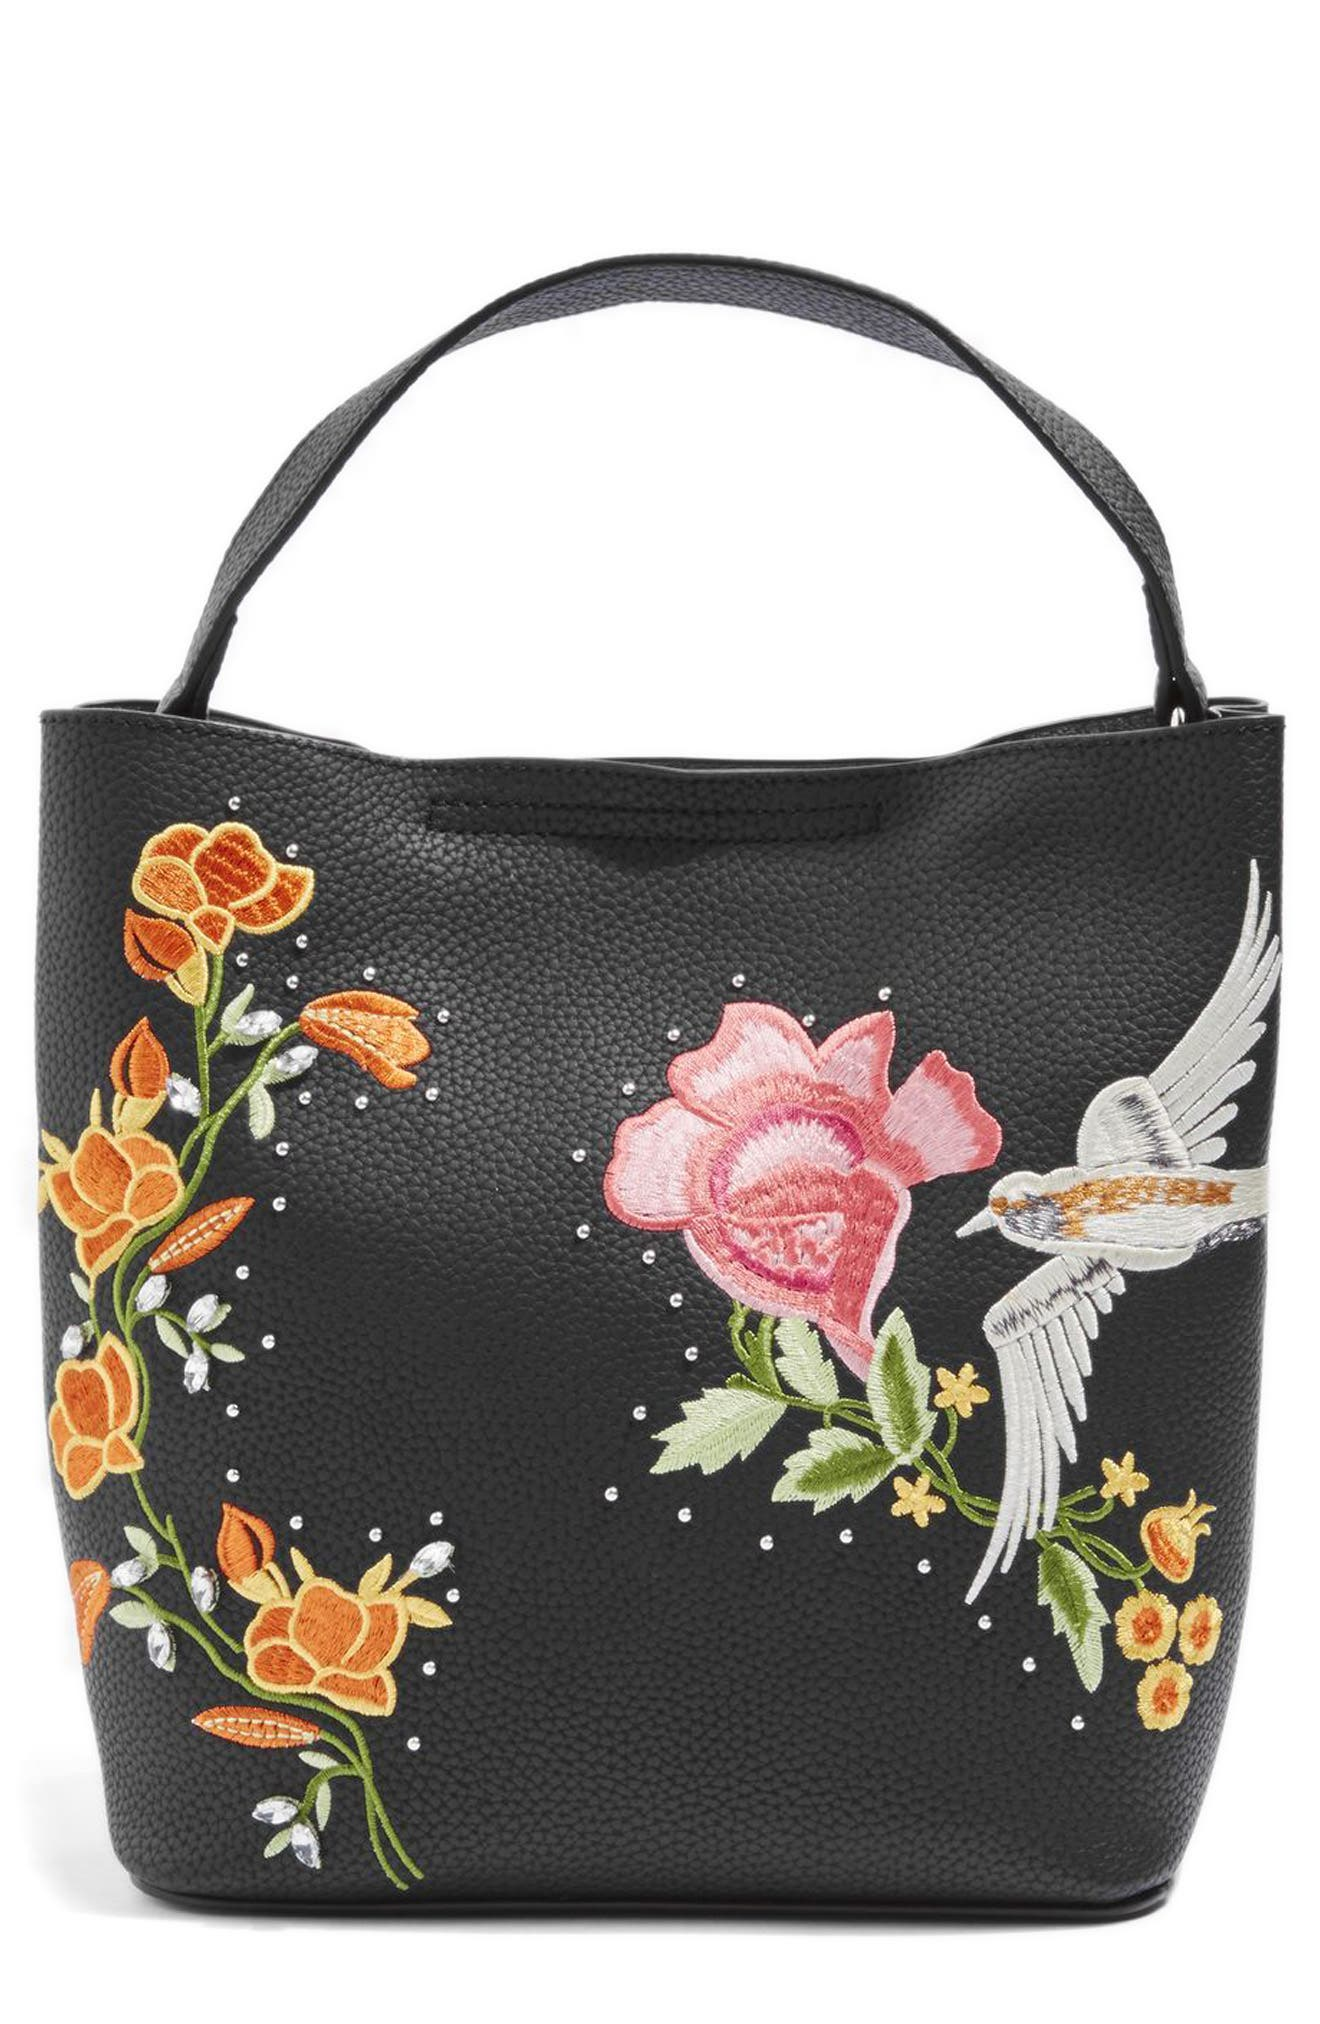 Alternate Image 1 Selected - Topshop Embellished Faux Leather Tote Bag